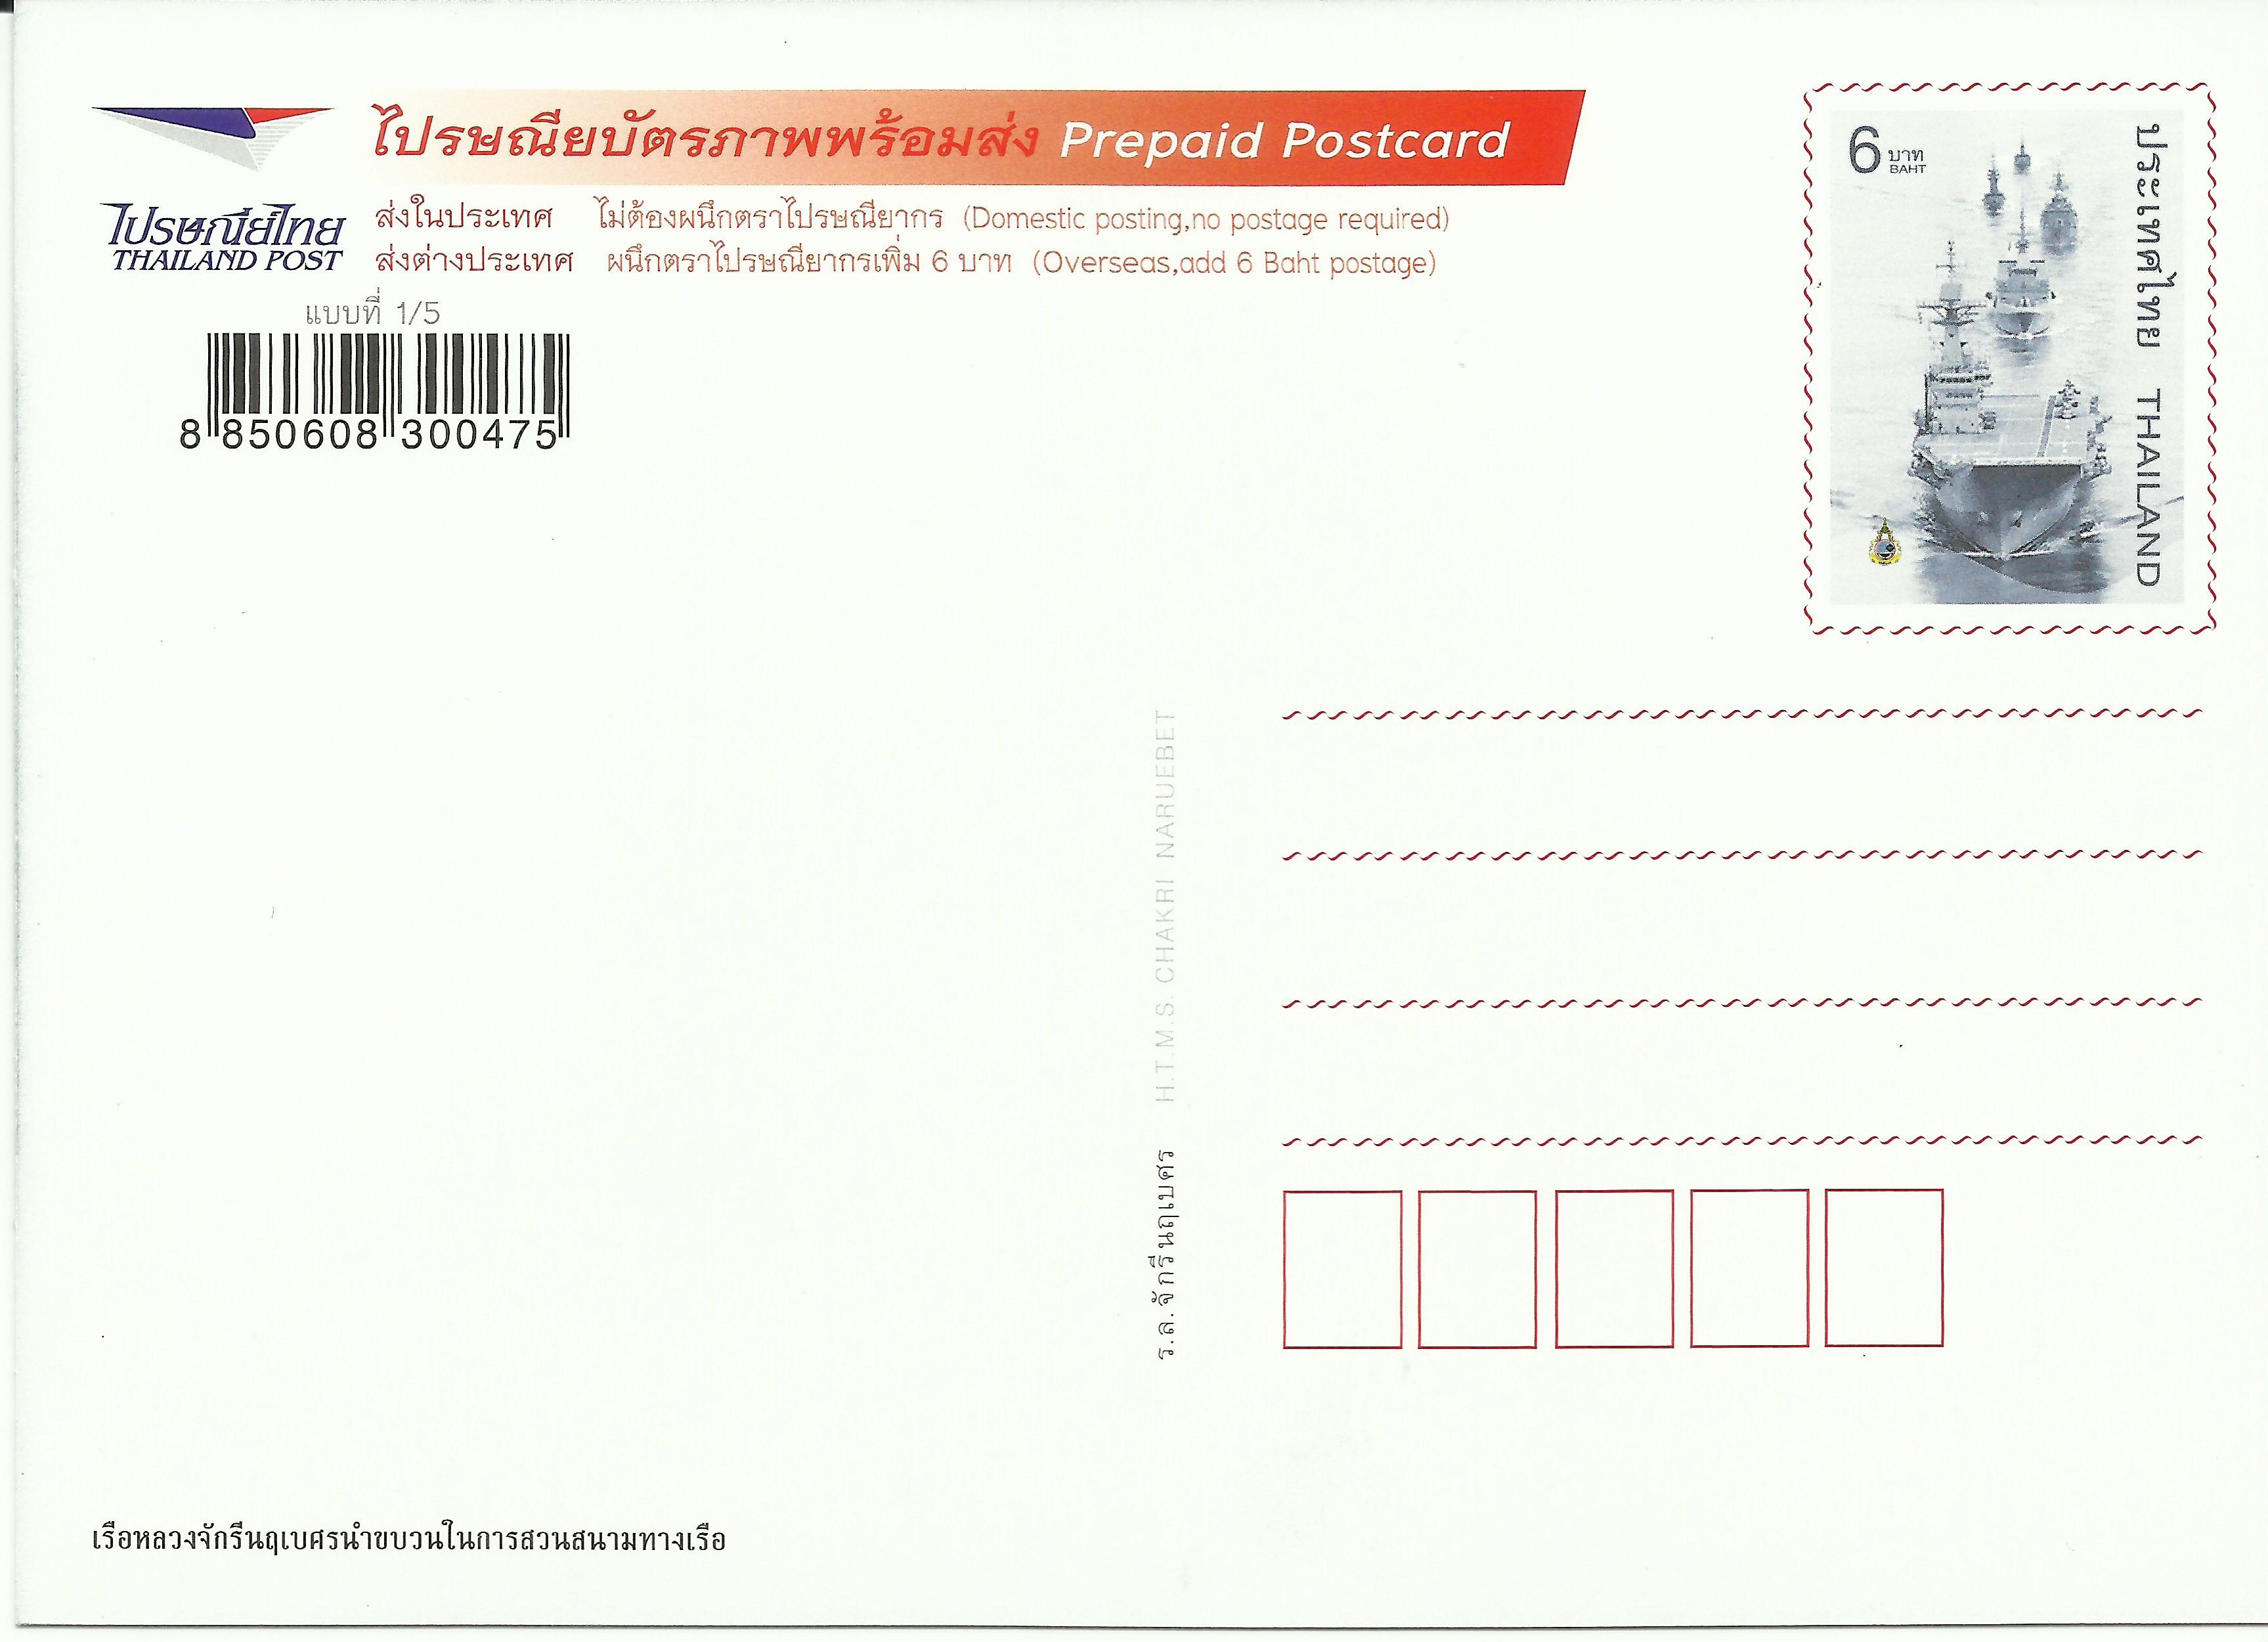 Thailand - Royal Thai Navy HTMS Chakri Naruebet pre-paid postal card #1 - 2014